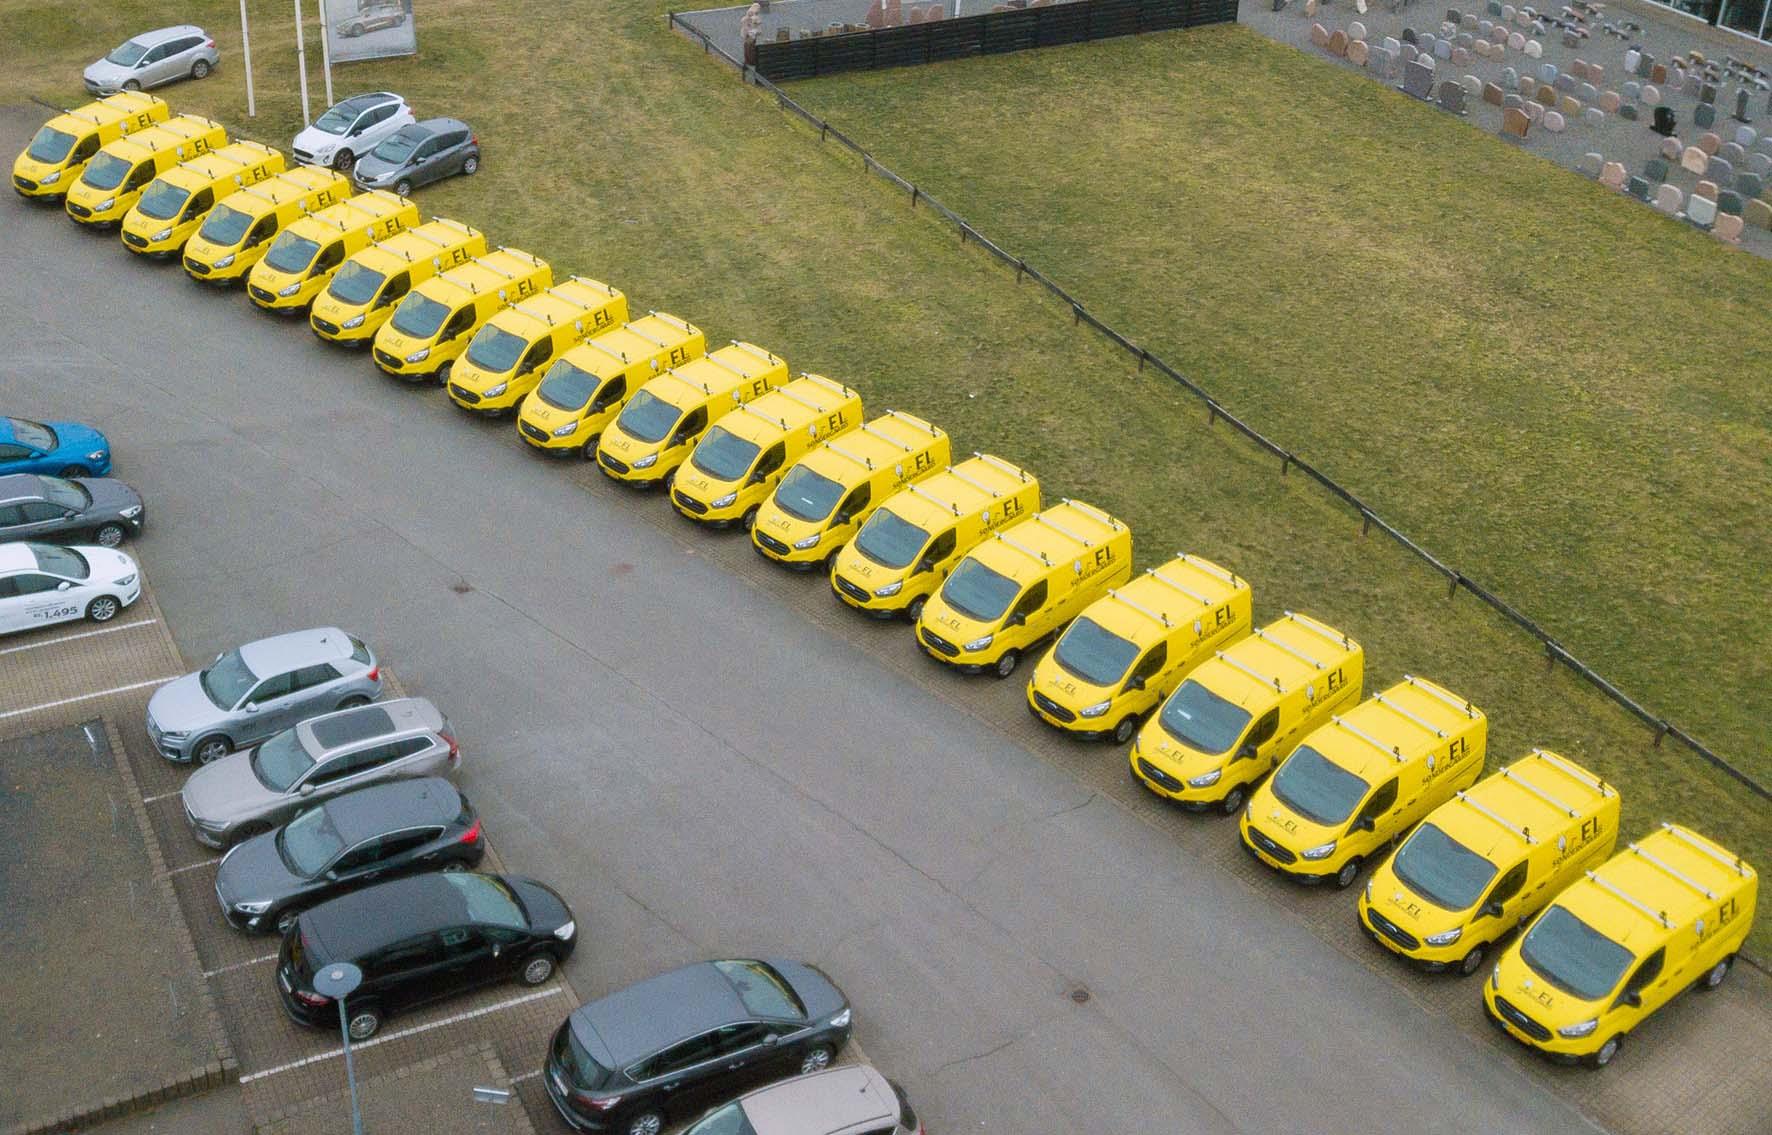 Mester fik leveret 21 nye Ford-varebiler på én gang